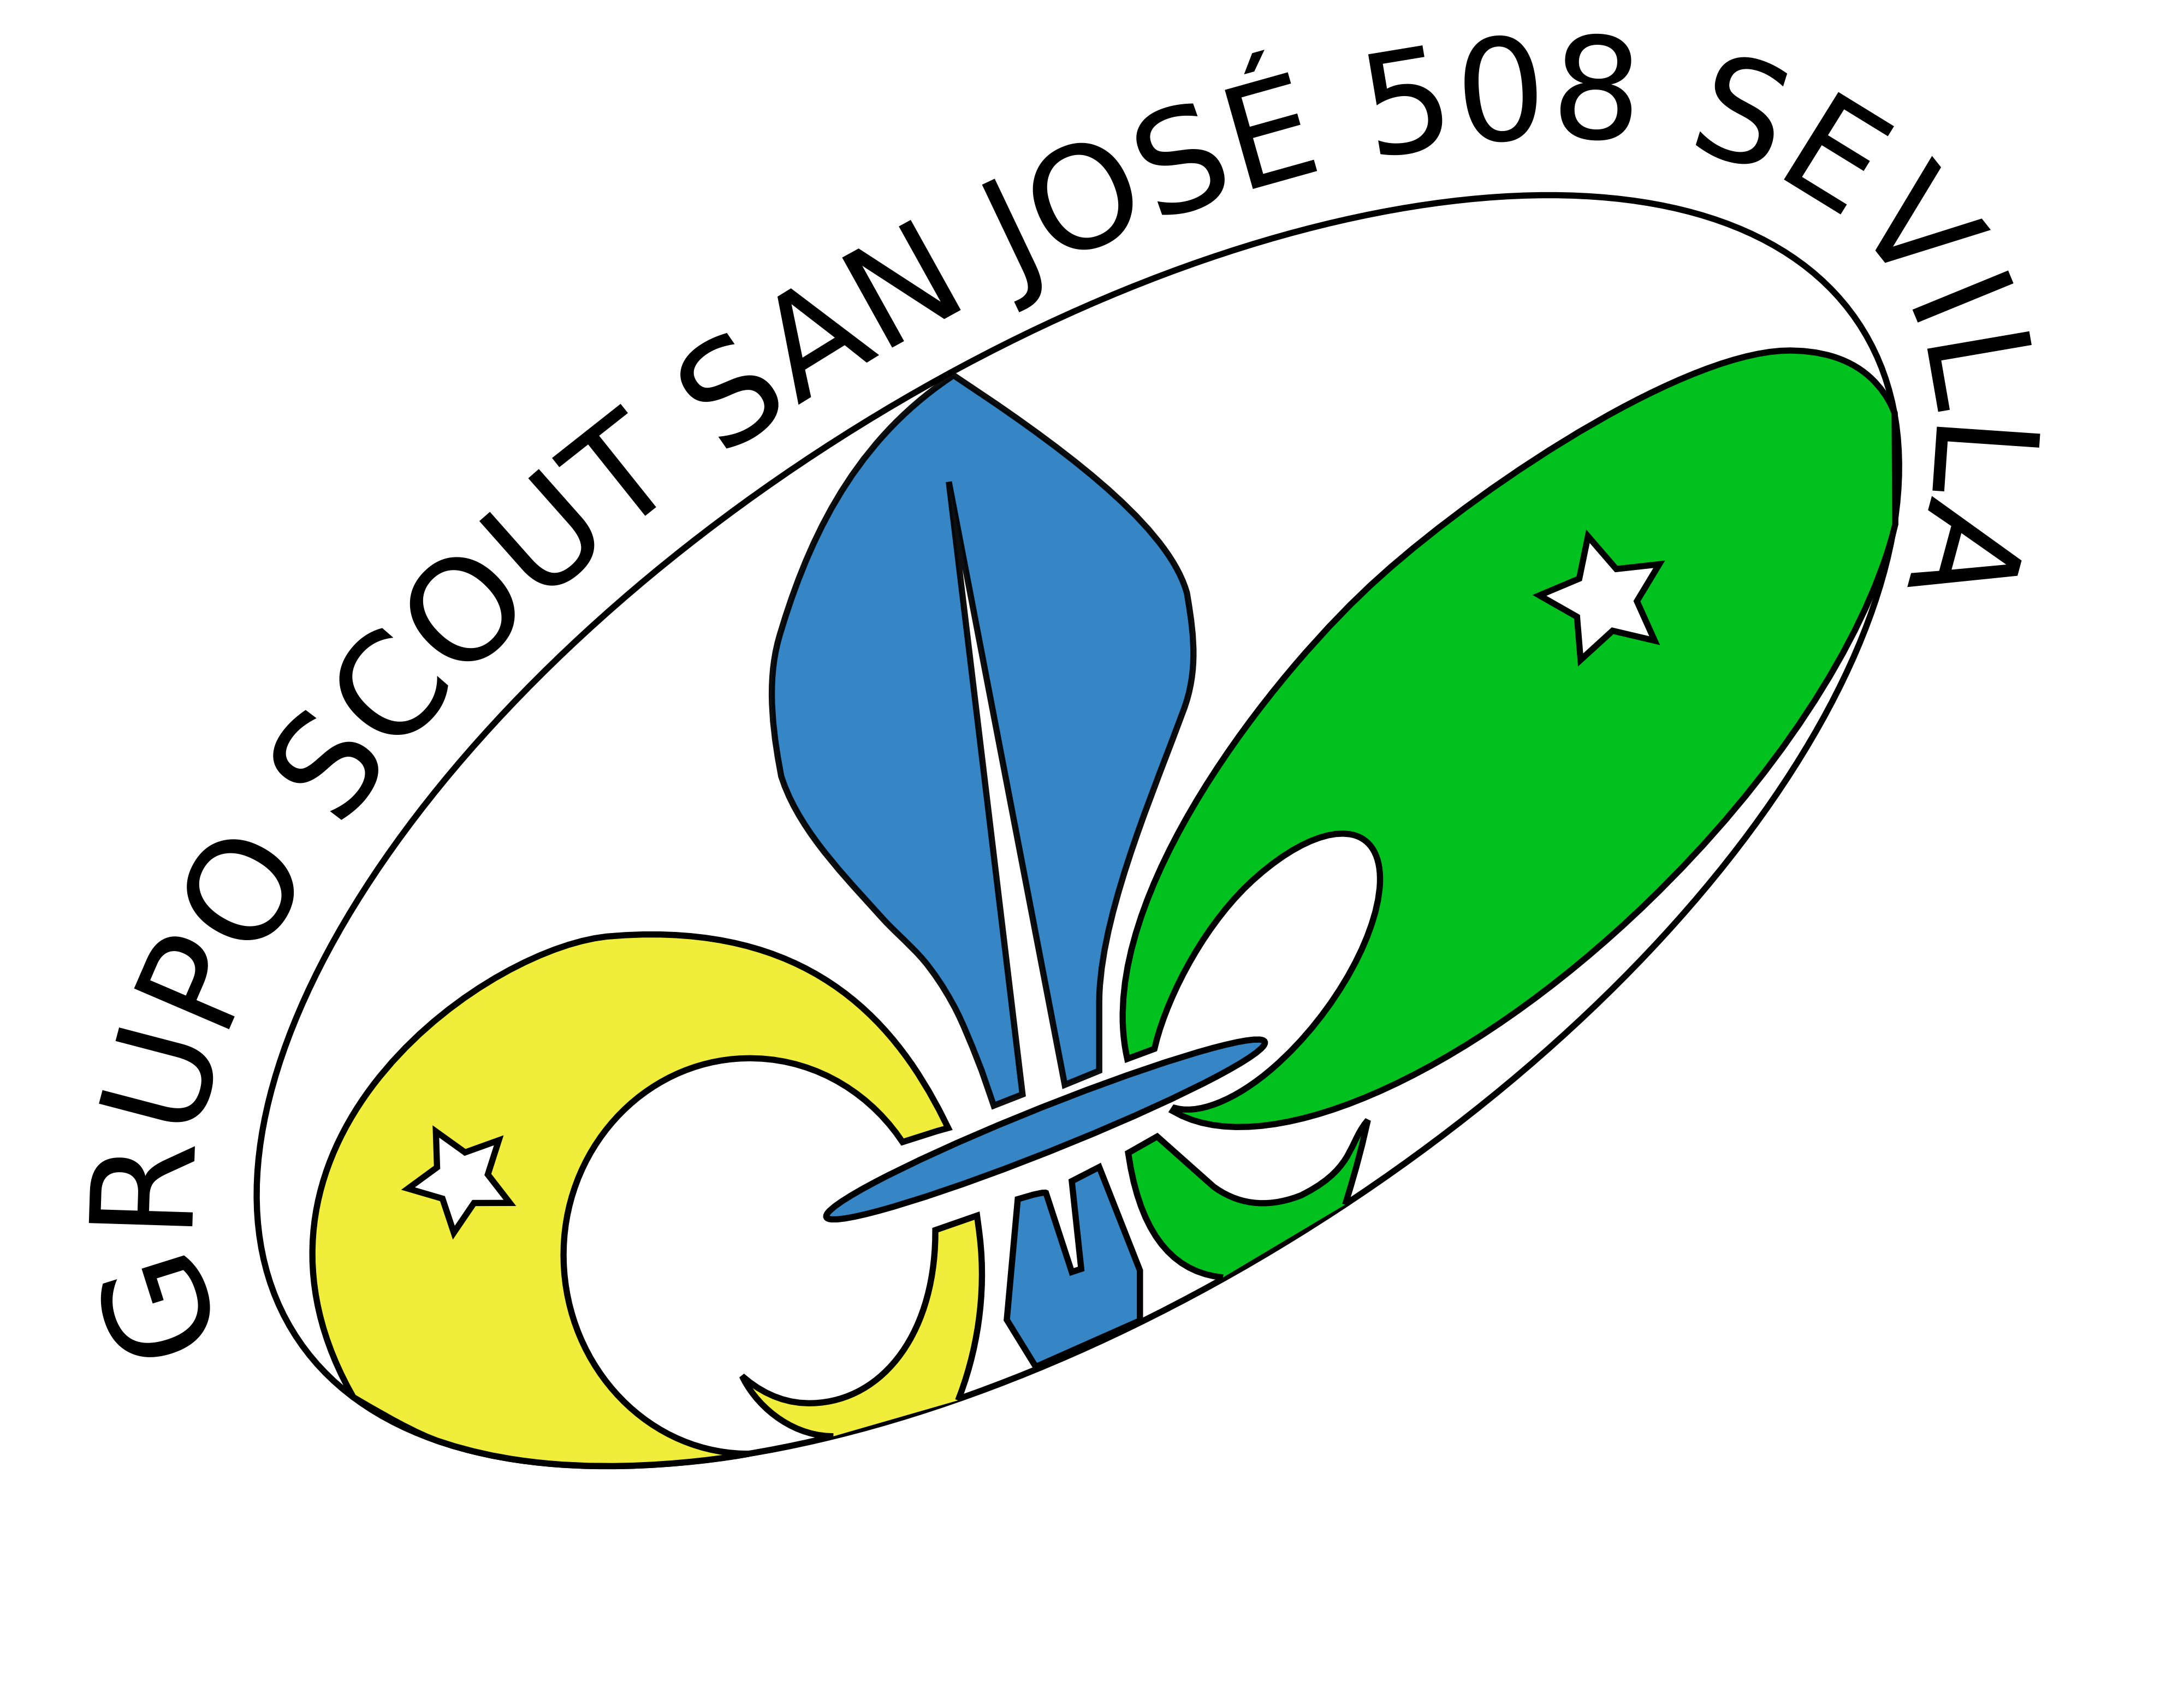 Grupo Scout 508 San José